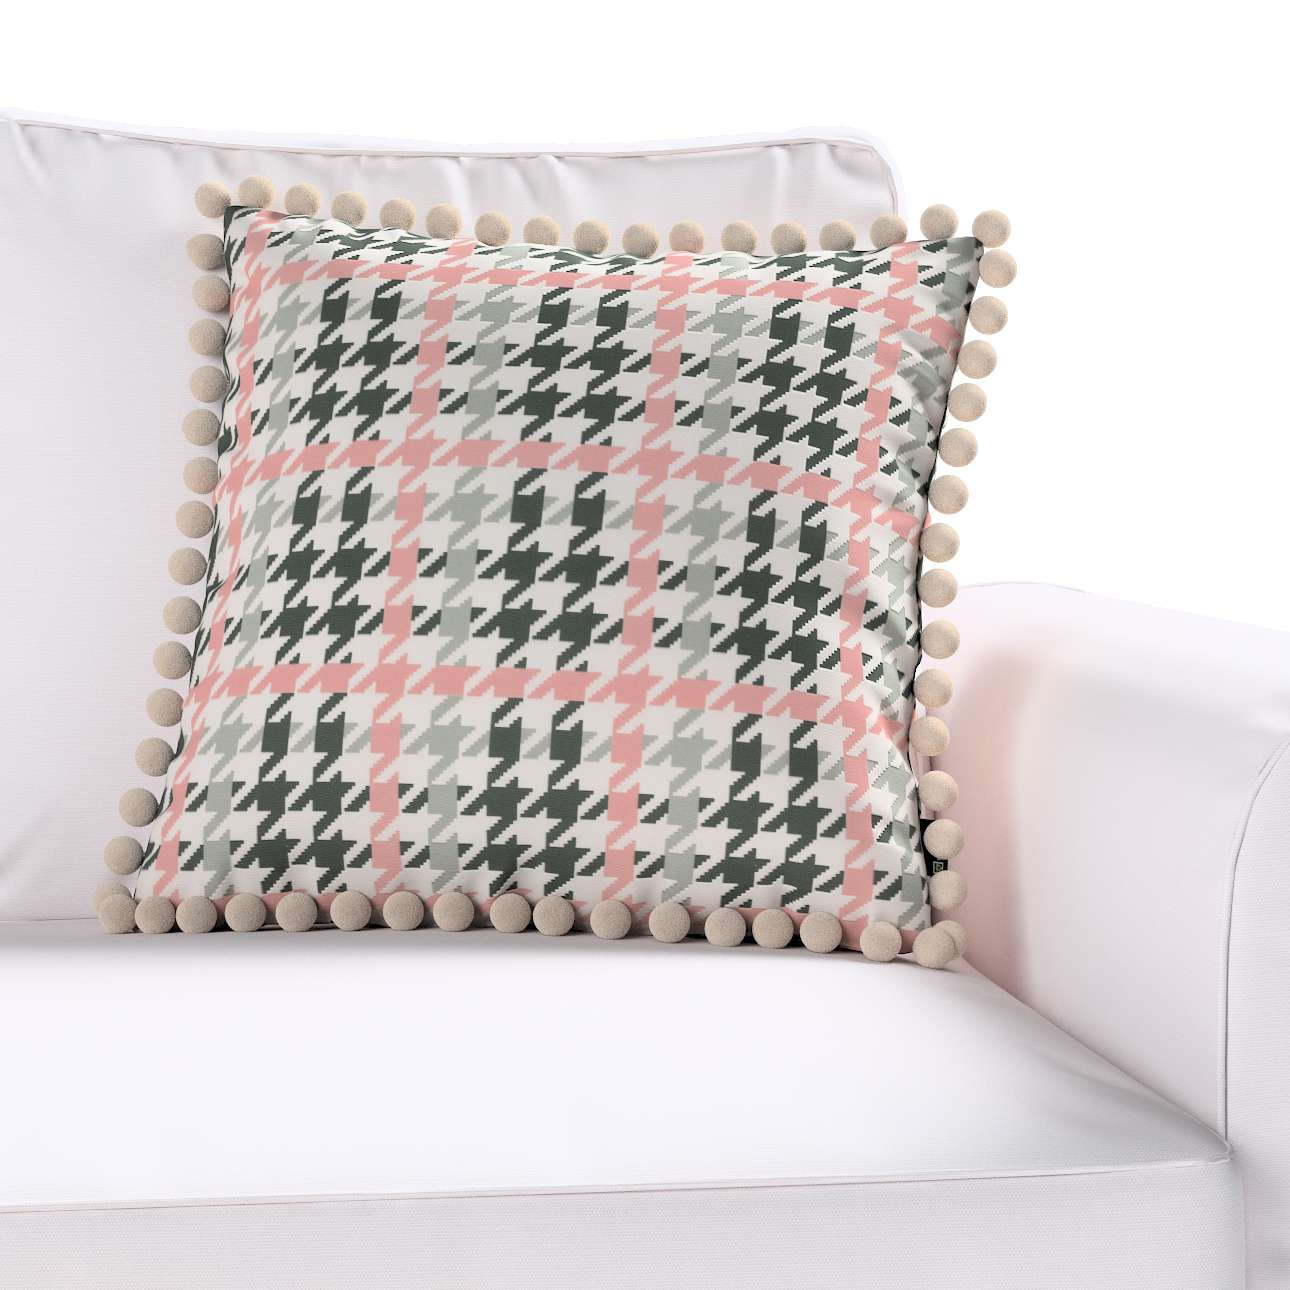 Poszewka Wera na poduszkę 45 x 45 cm w kolekcji Brooklyn, tkanina: 137-75